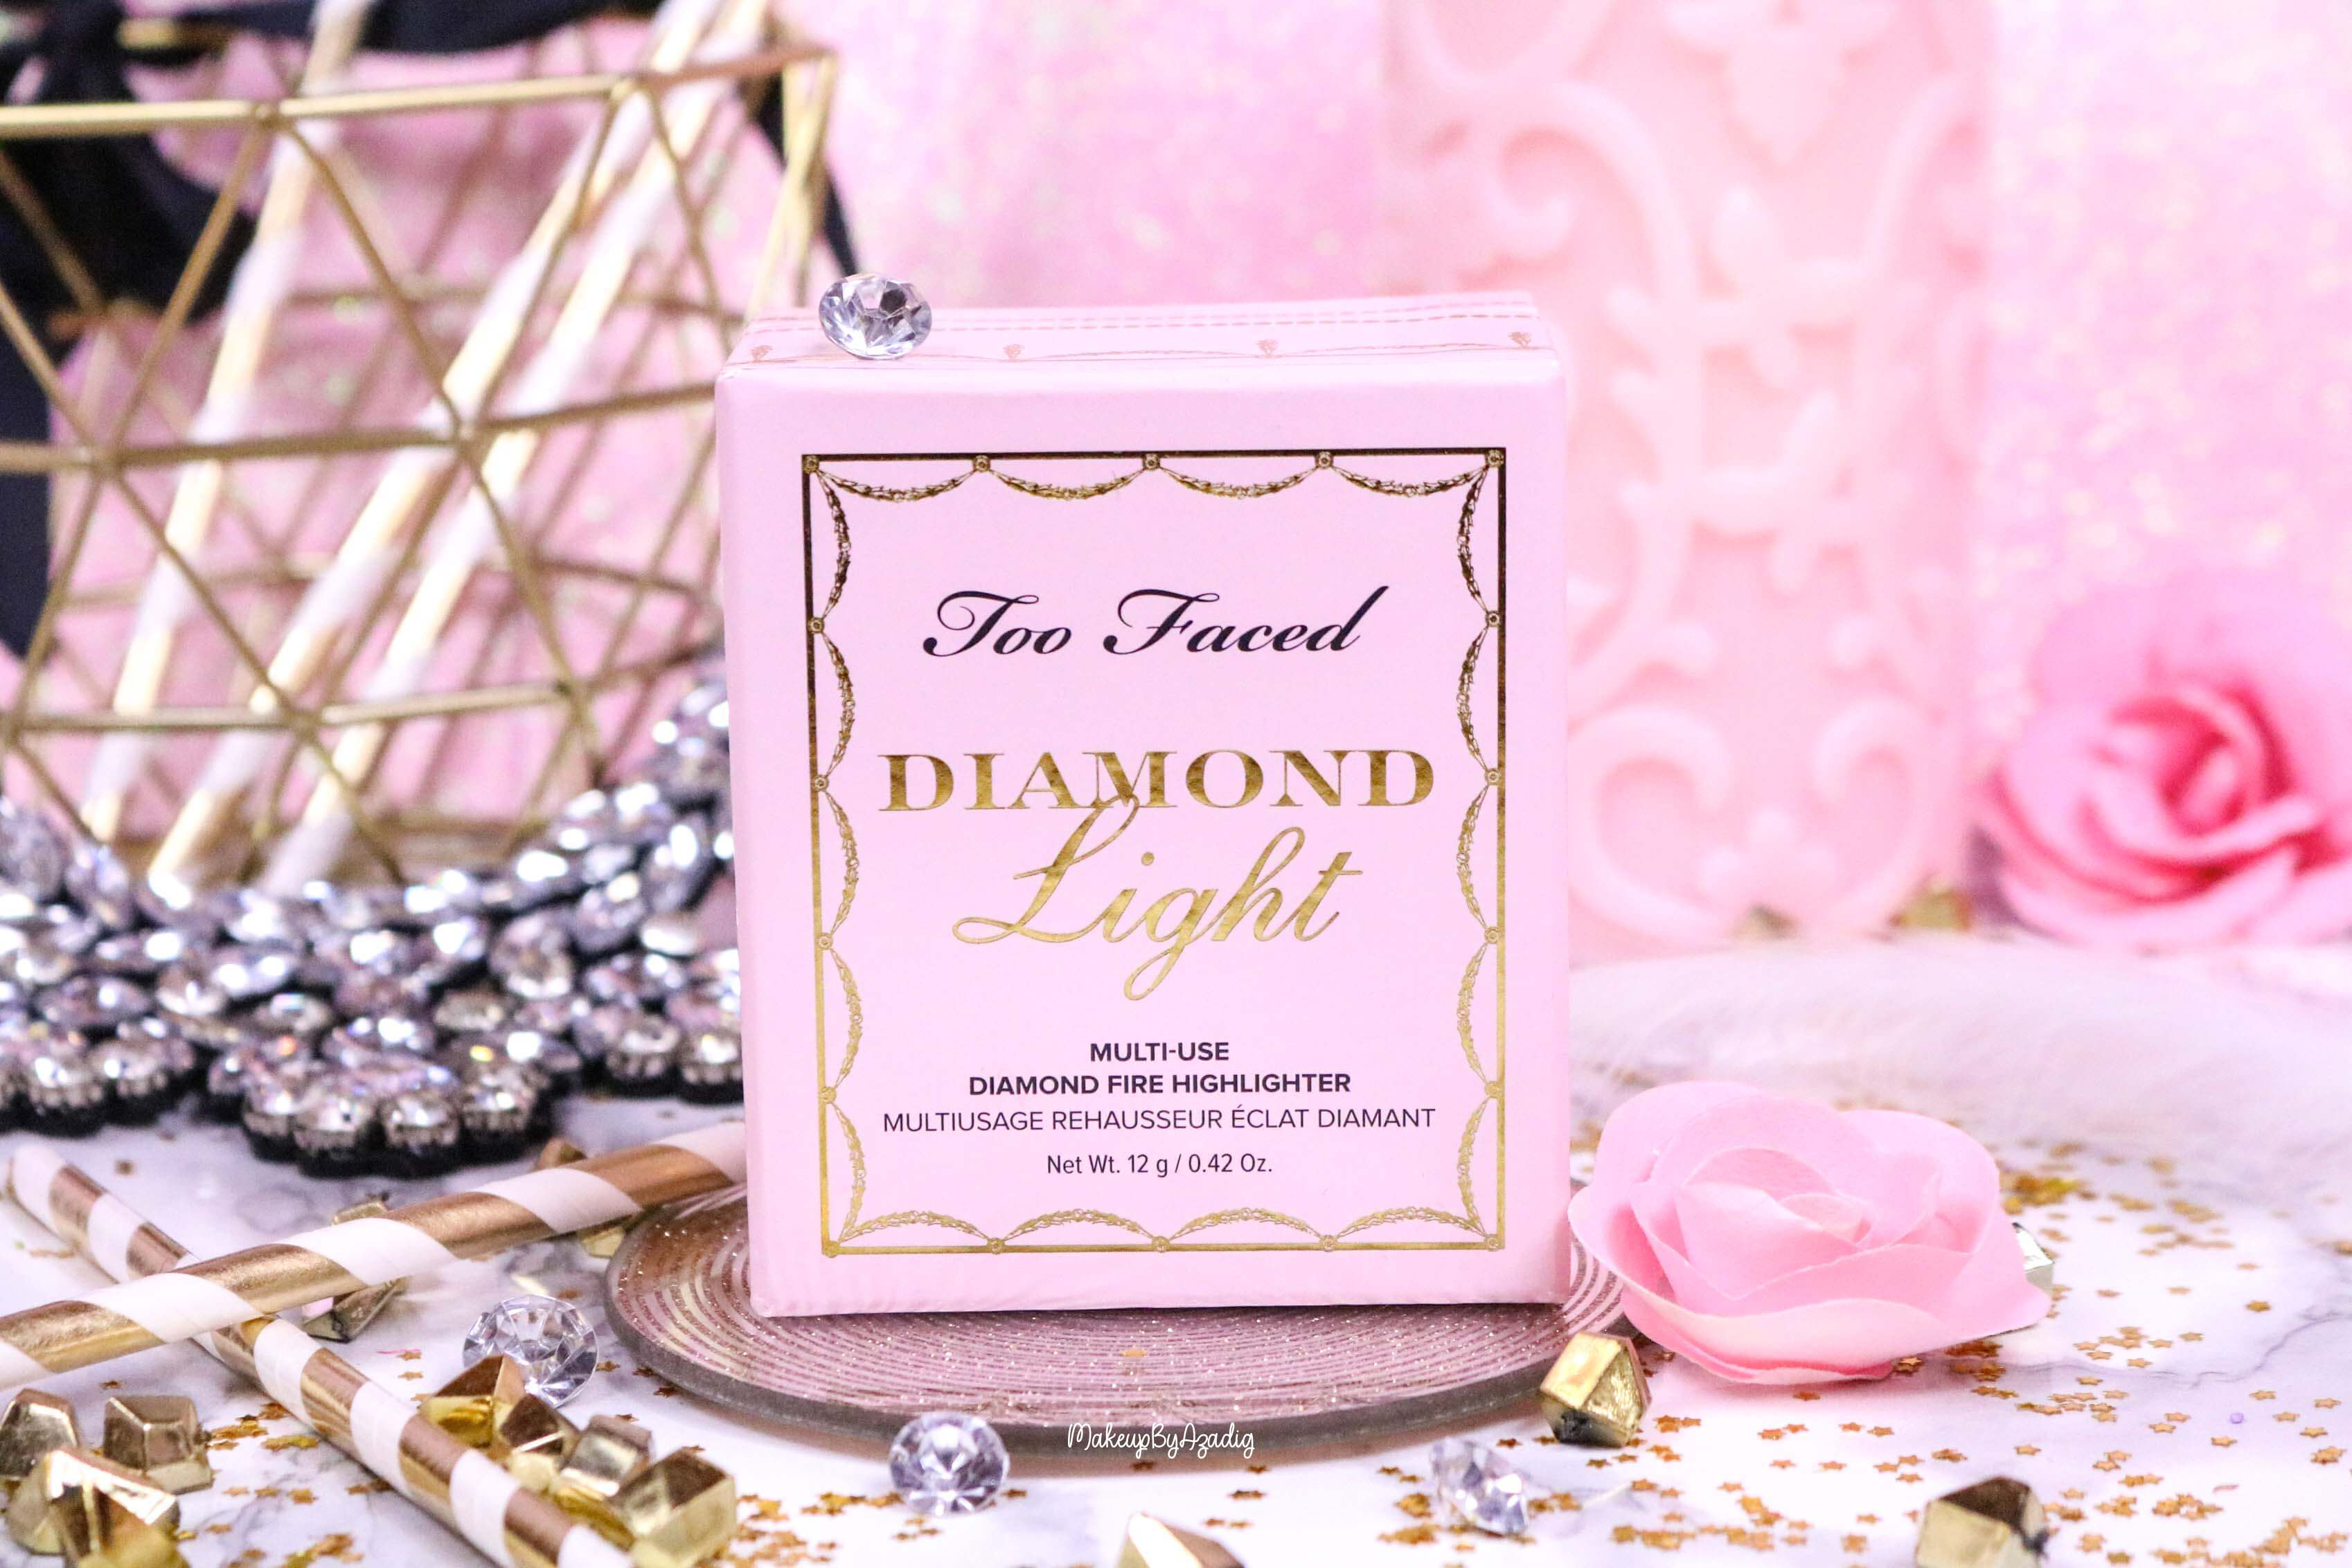 revue-highlighter-diamond-light-toofaced-enlumineur-diamant-collection-makeup-makeupbyazadig-sortie-france-influencer-swatch-avis-prix-eclat